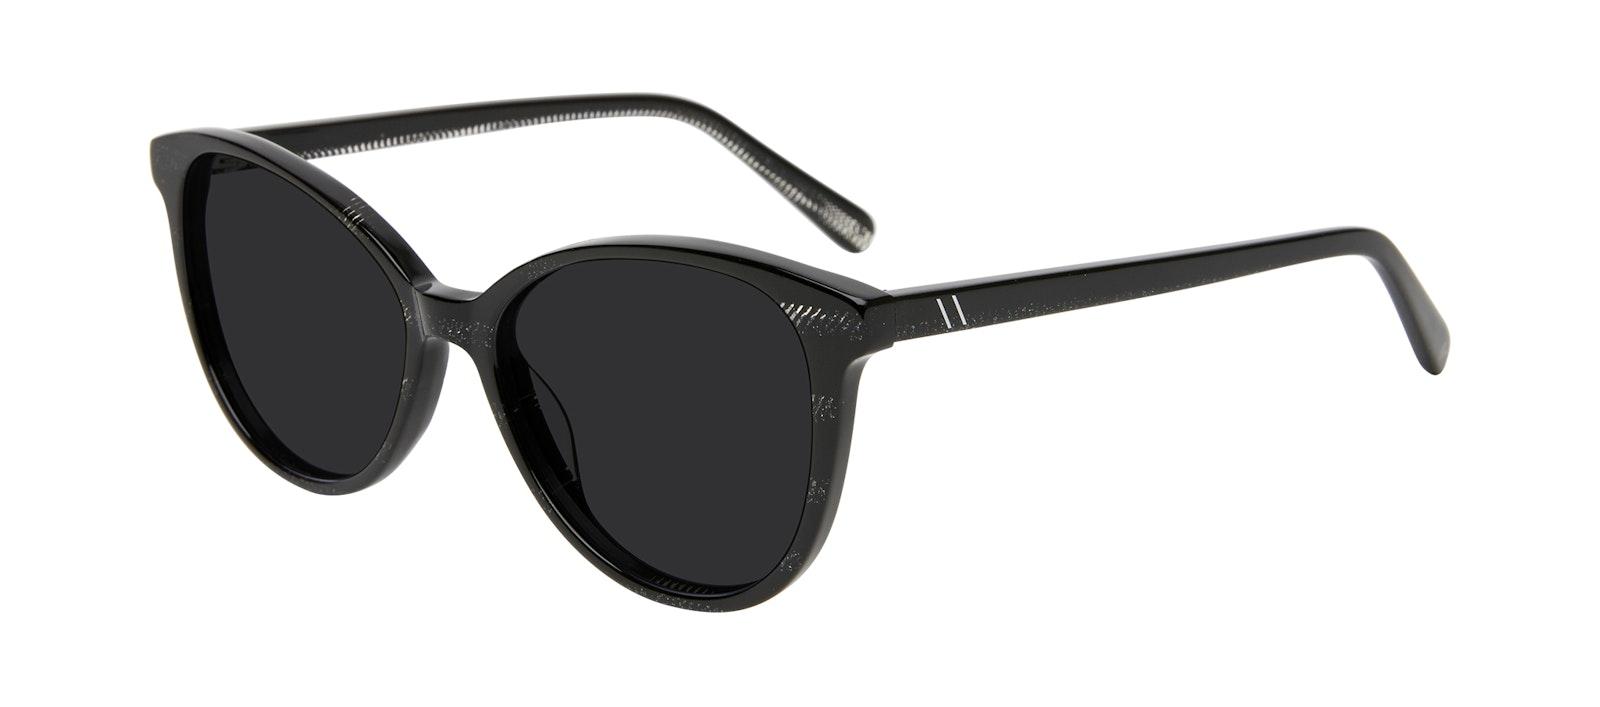 Affordable Fashion Glasses Cat Eye Sunglasses Women Esprit L Night Tilt